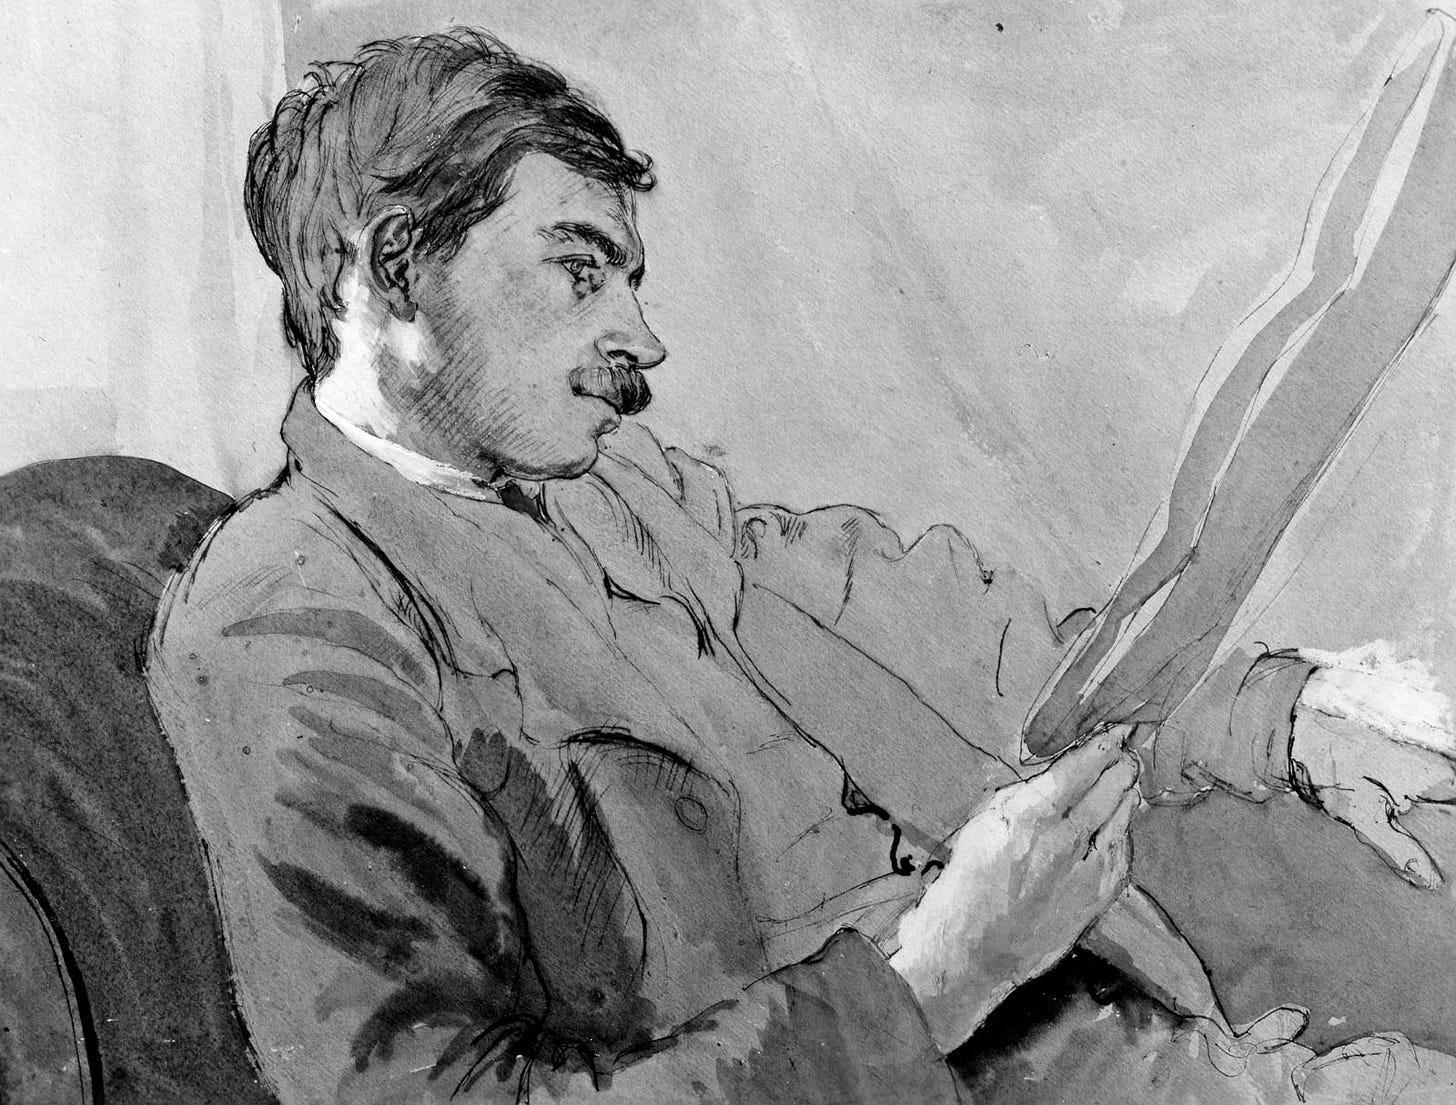 John Maynard Keynes | Biography, Theory, Economics, Books, & Facts ...